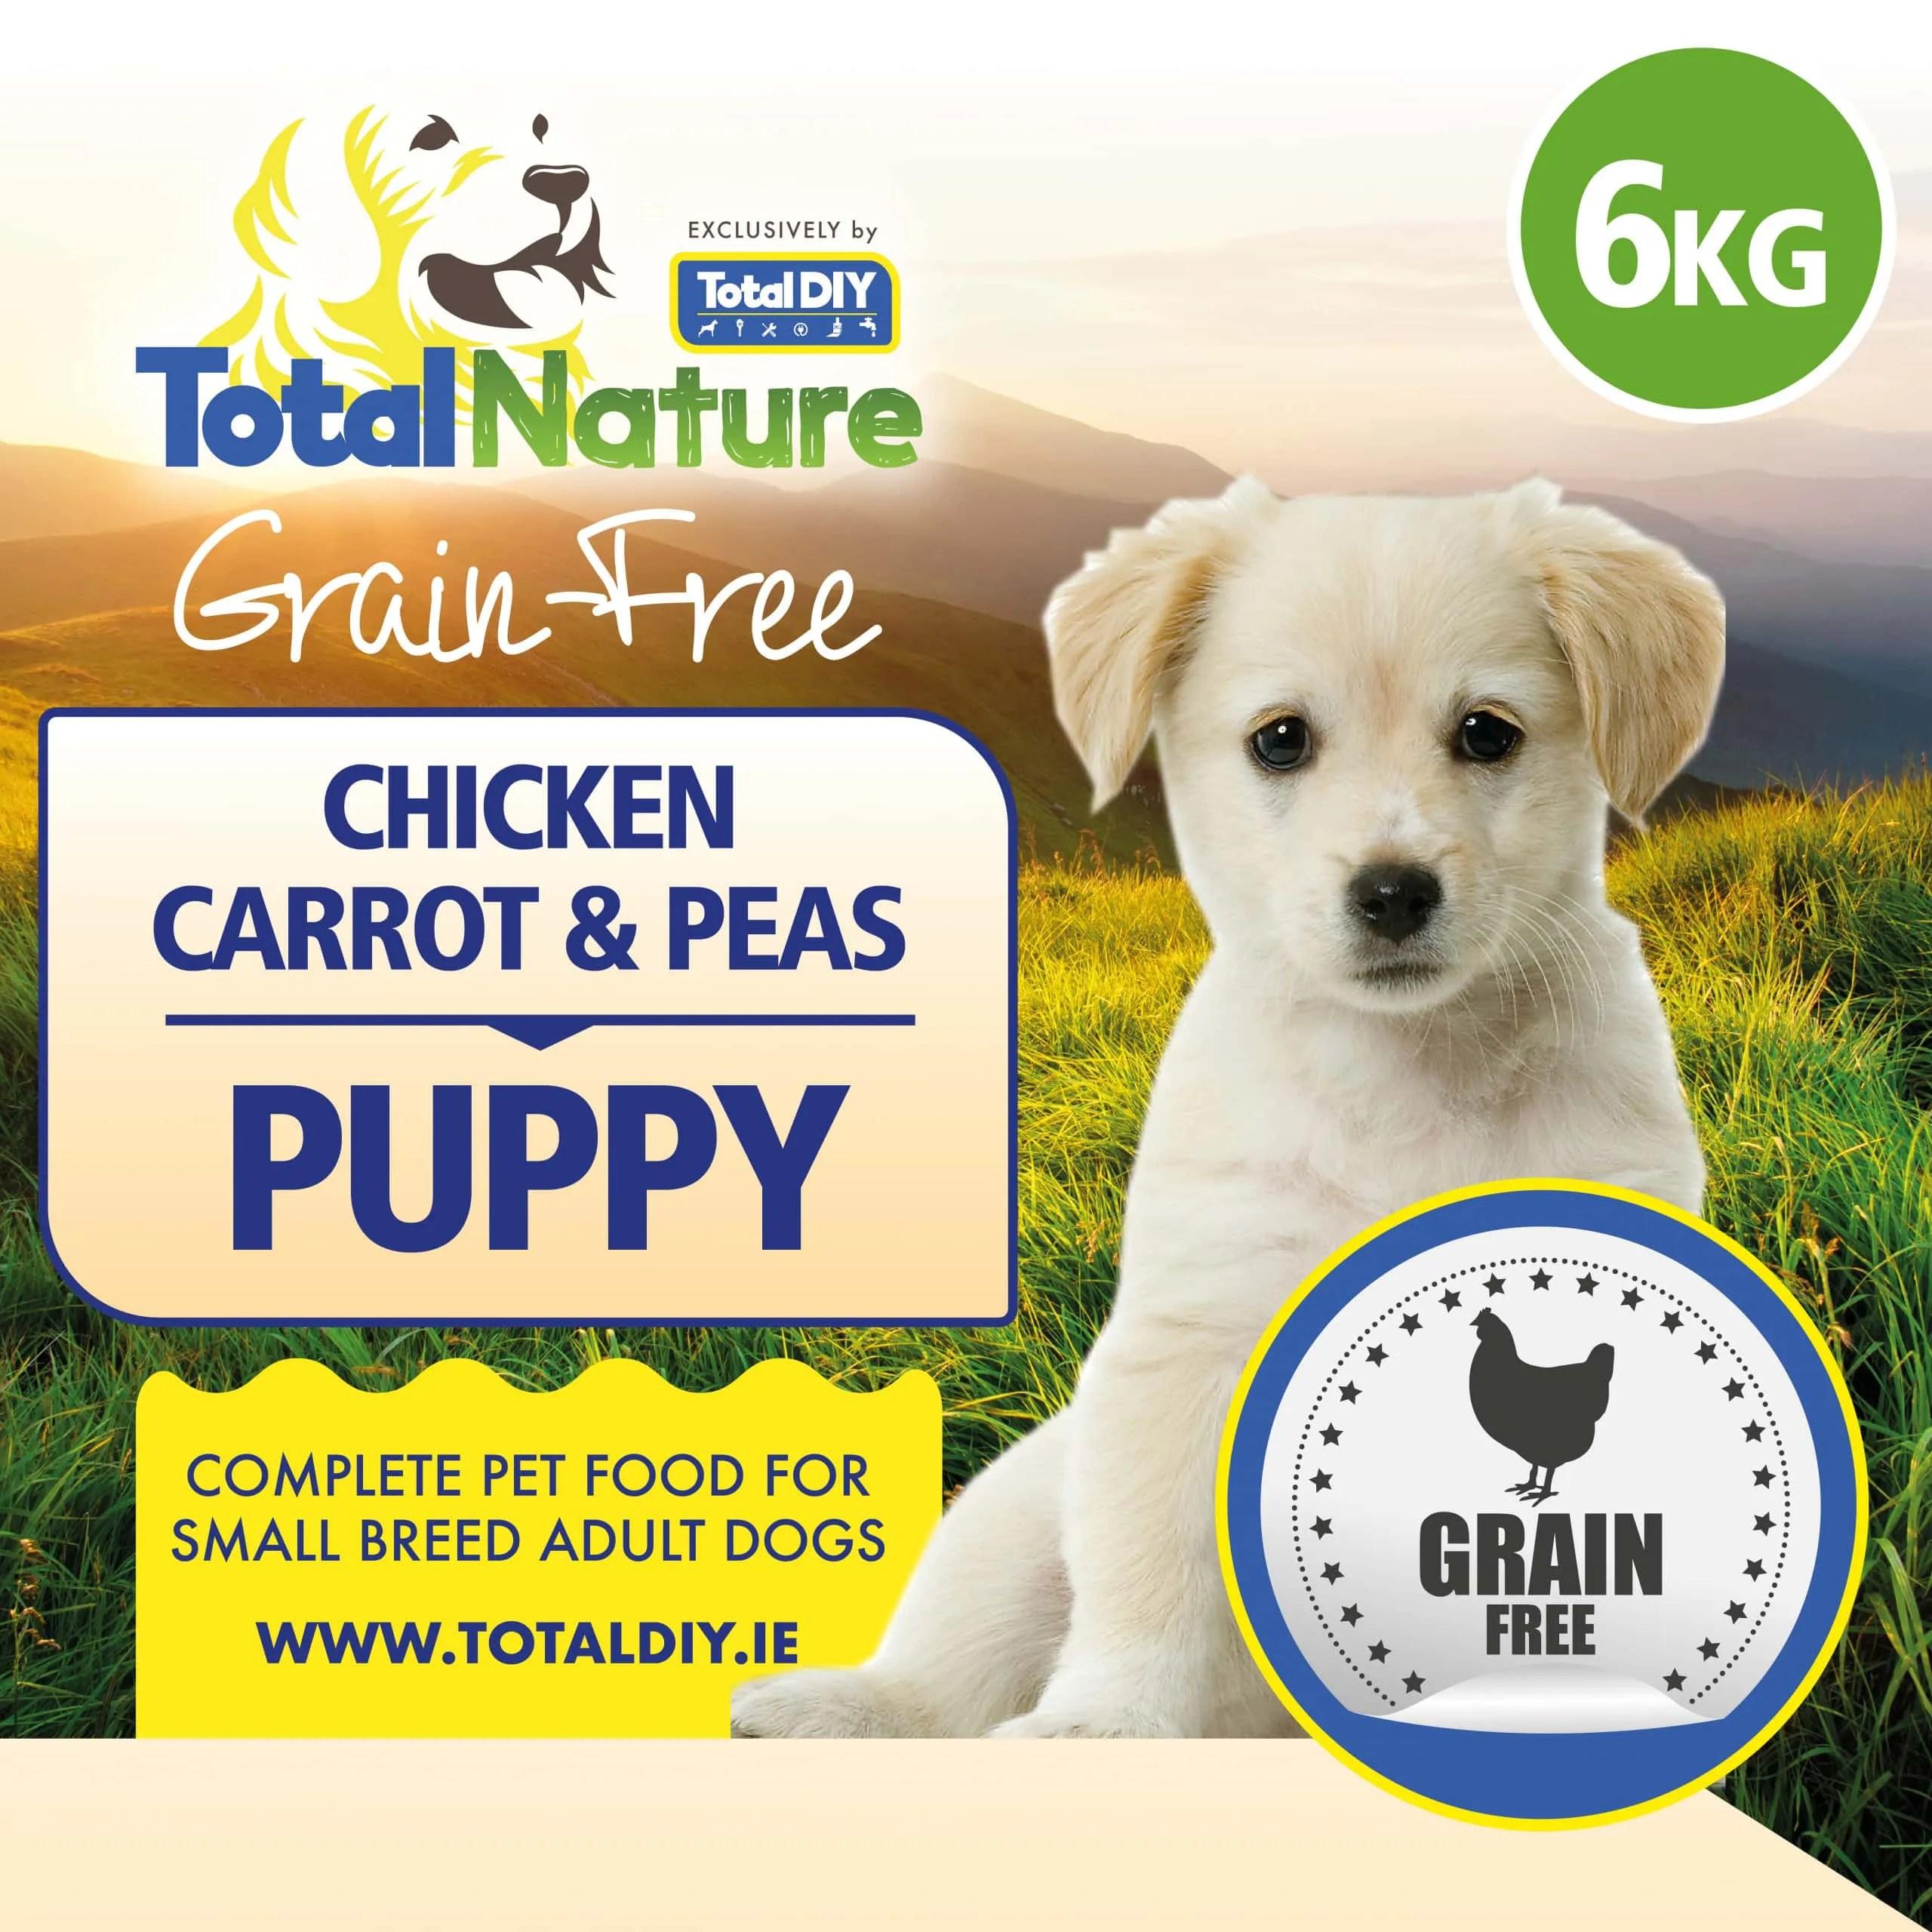 Total-Nature-Grainfree-Puppy-Chicken-Carrot-Peas-6kg